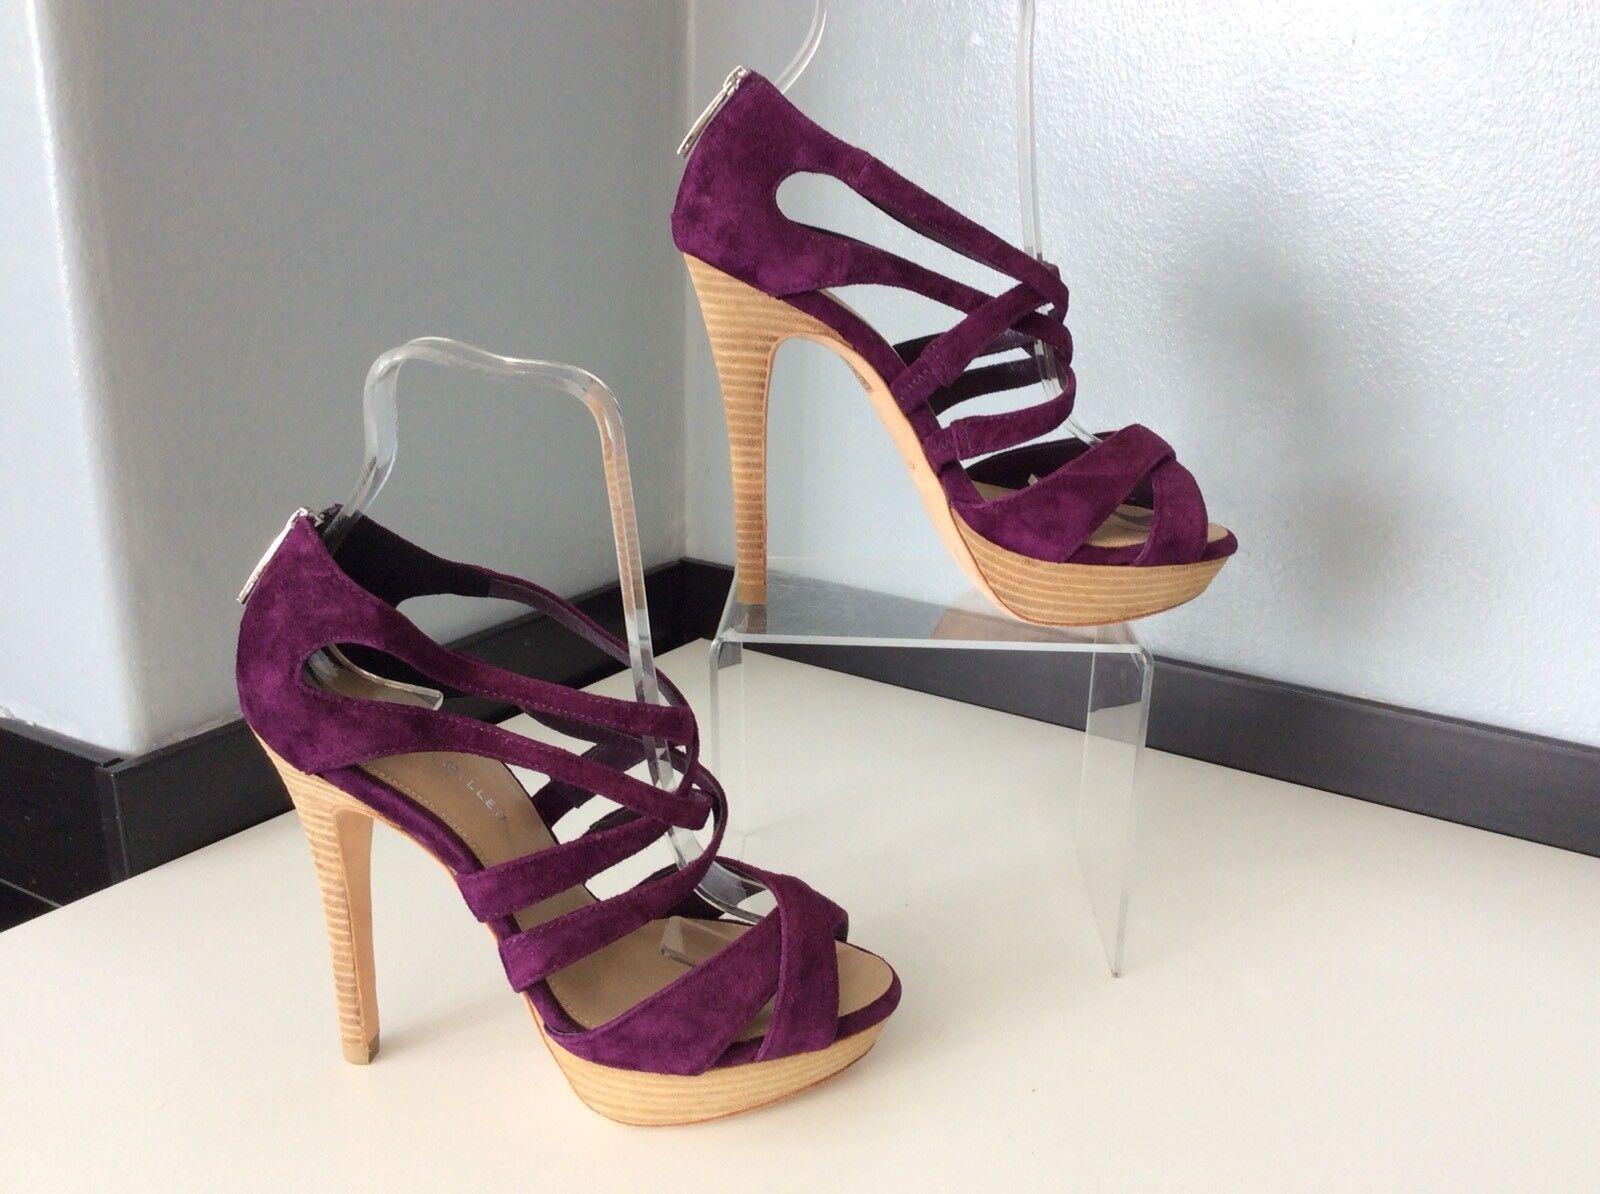 Karen Karen Karen Millen Zapatos NUEVOS ANTE MORADO Tacones Peep Talla 36 Reino Unido 3  envío rápido en todo el mundo